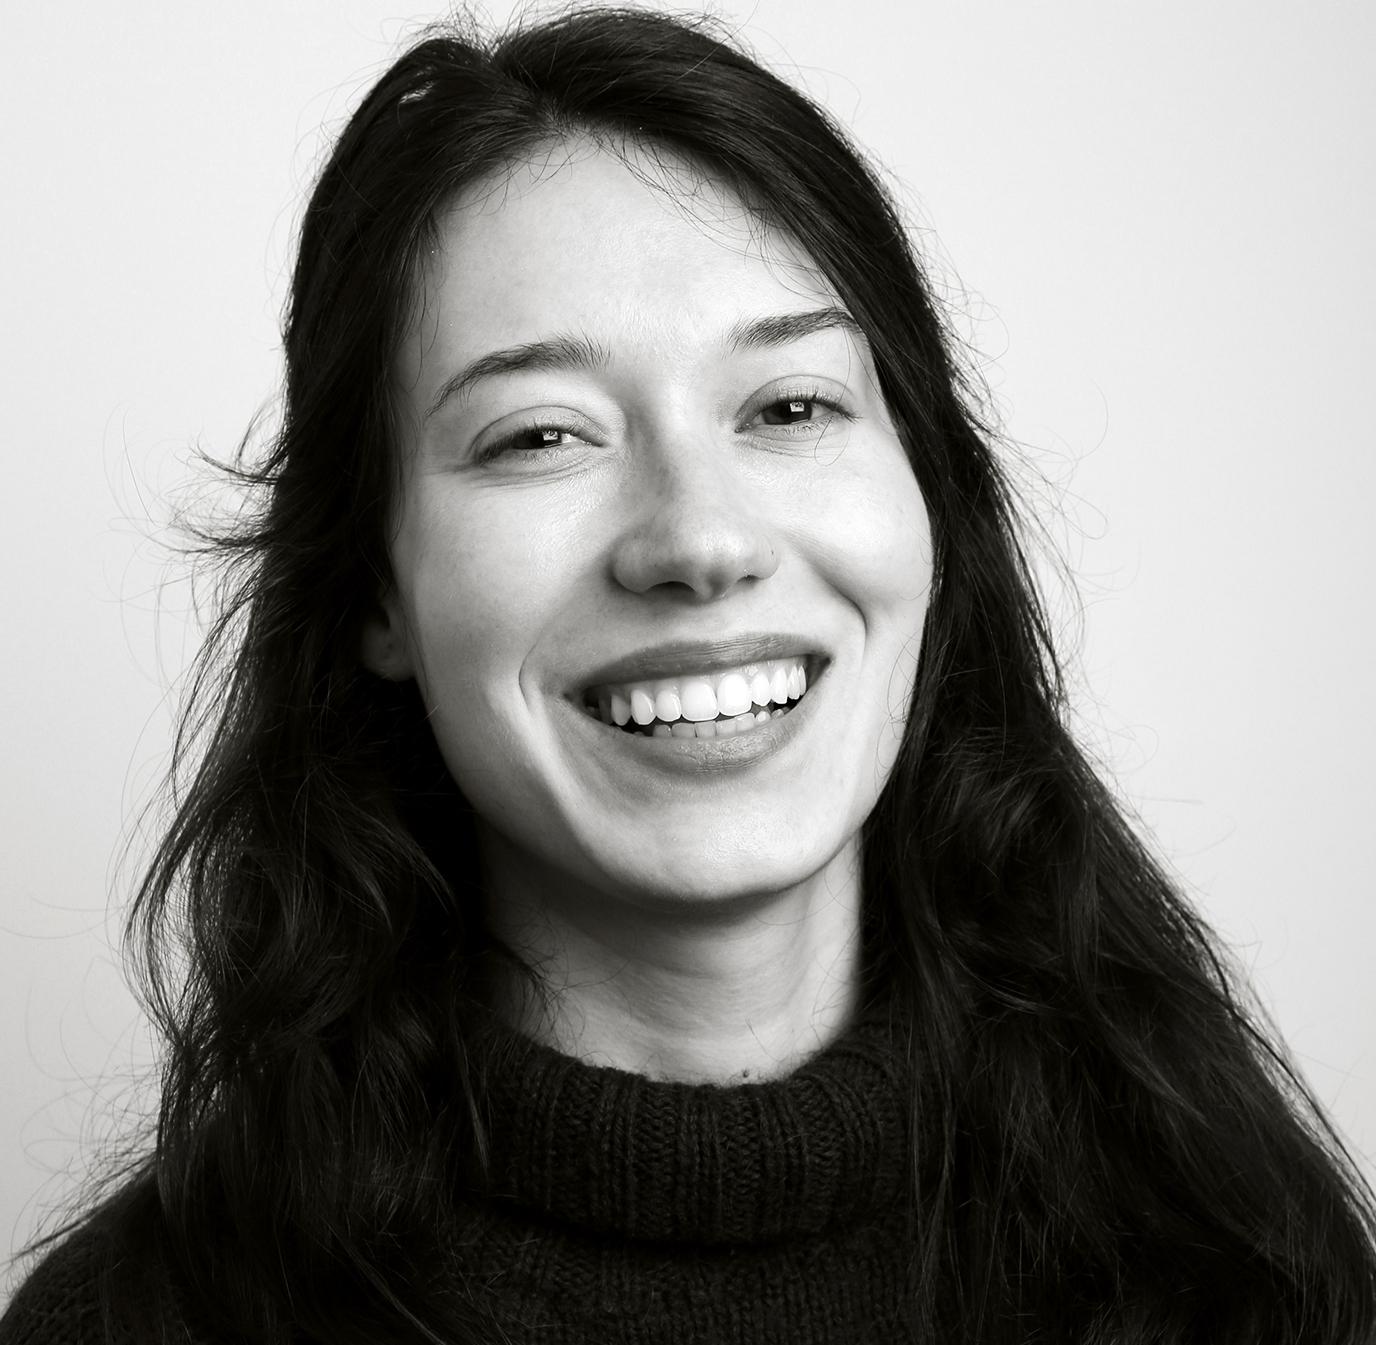 Maria Milenova